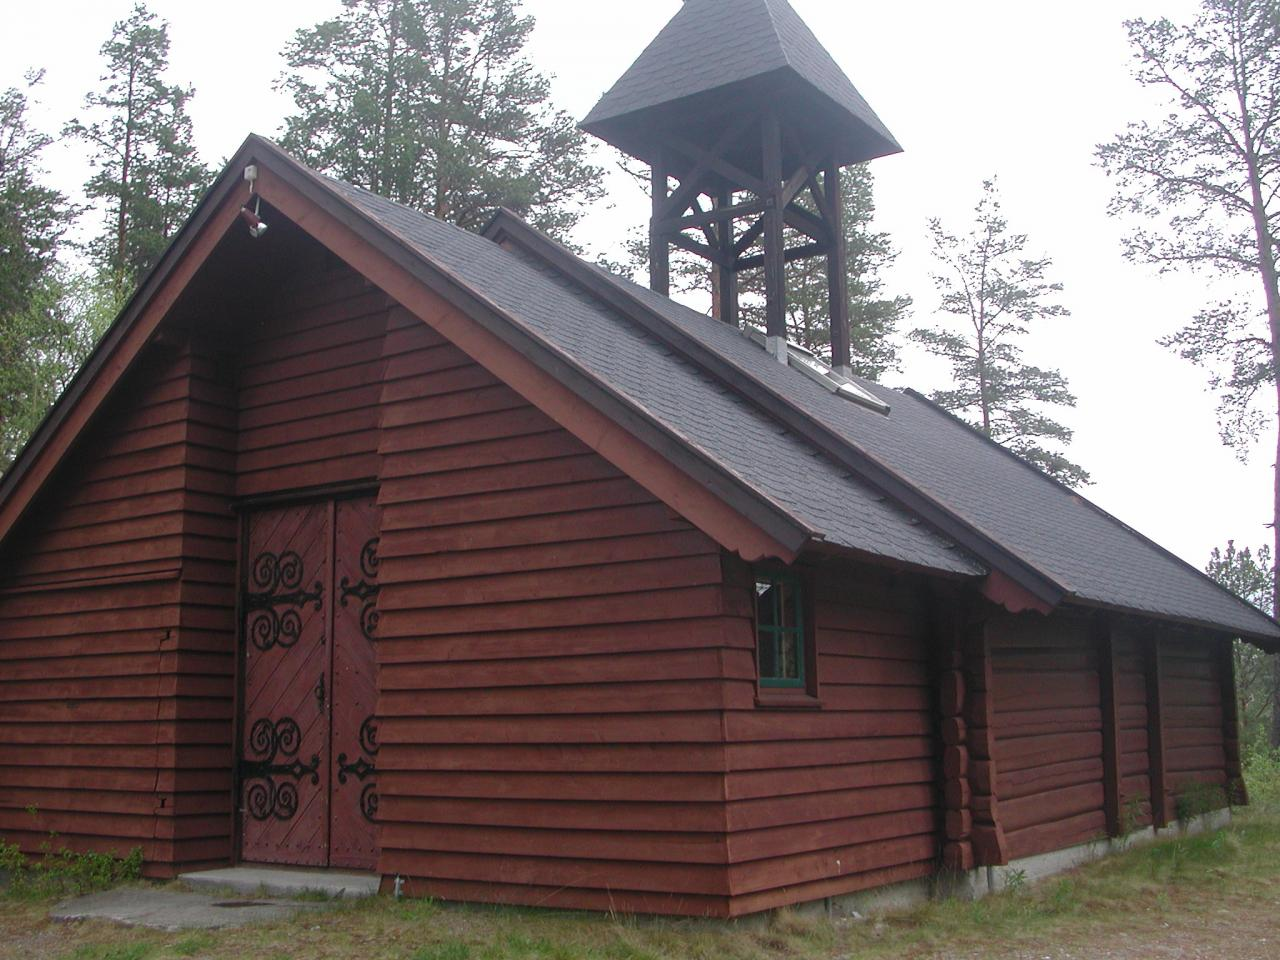 https://folldal.kirken.no/img/11_07_07_Egnund_kapell/Kirke6.jpg